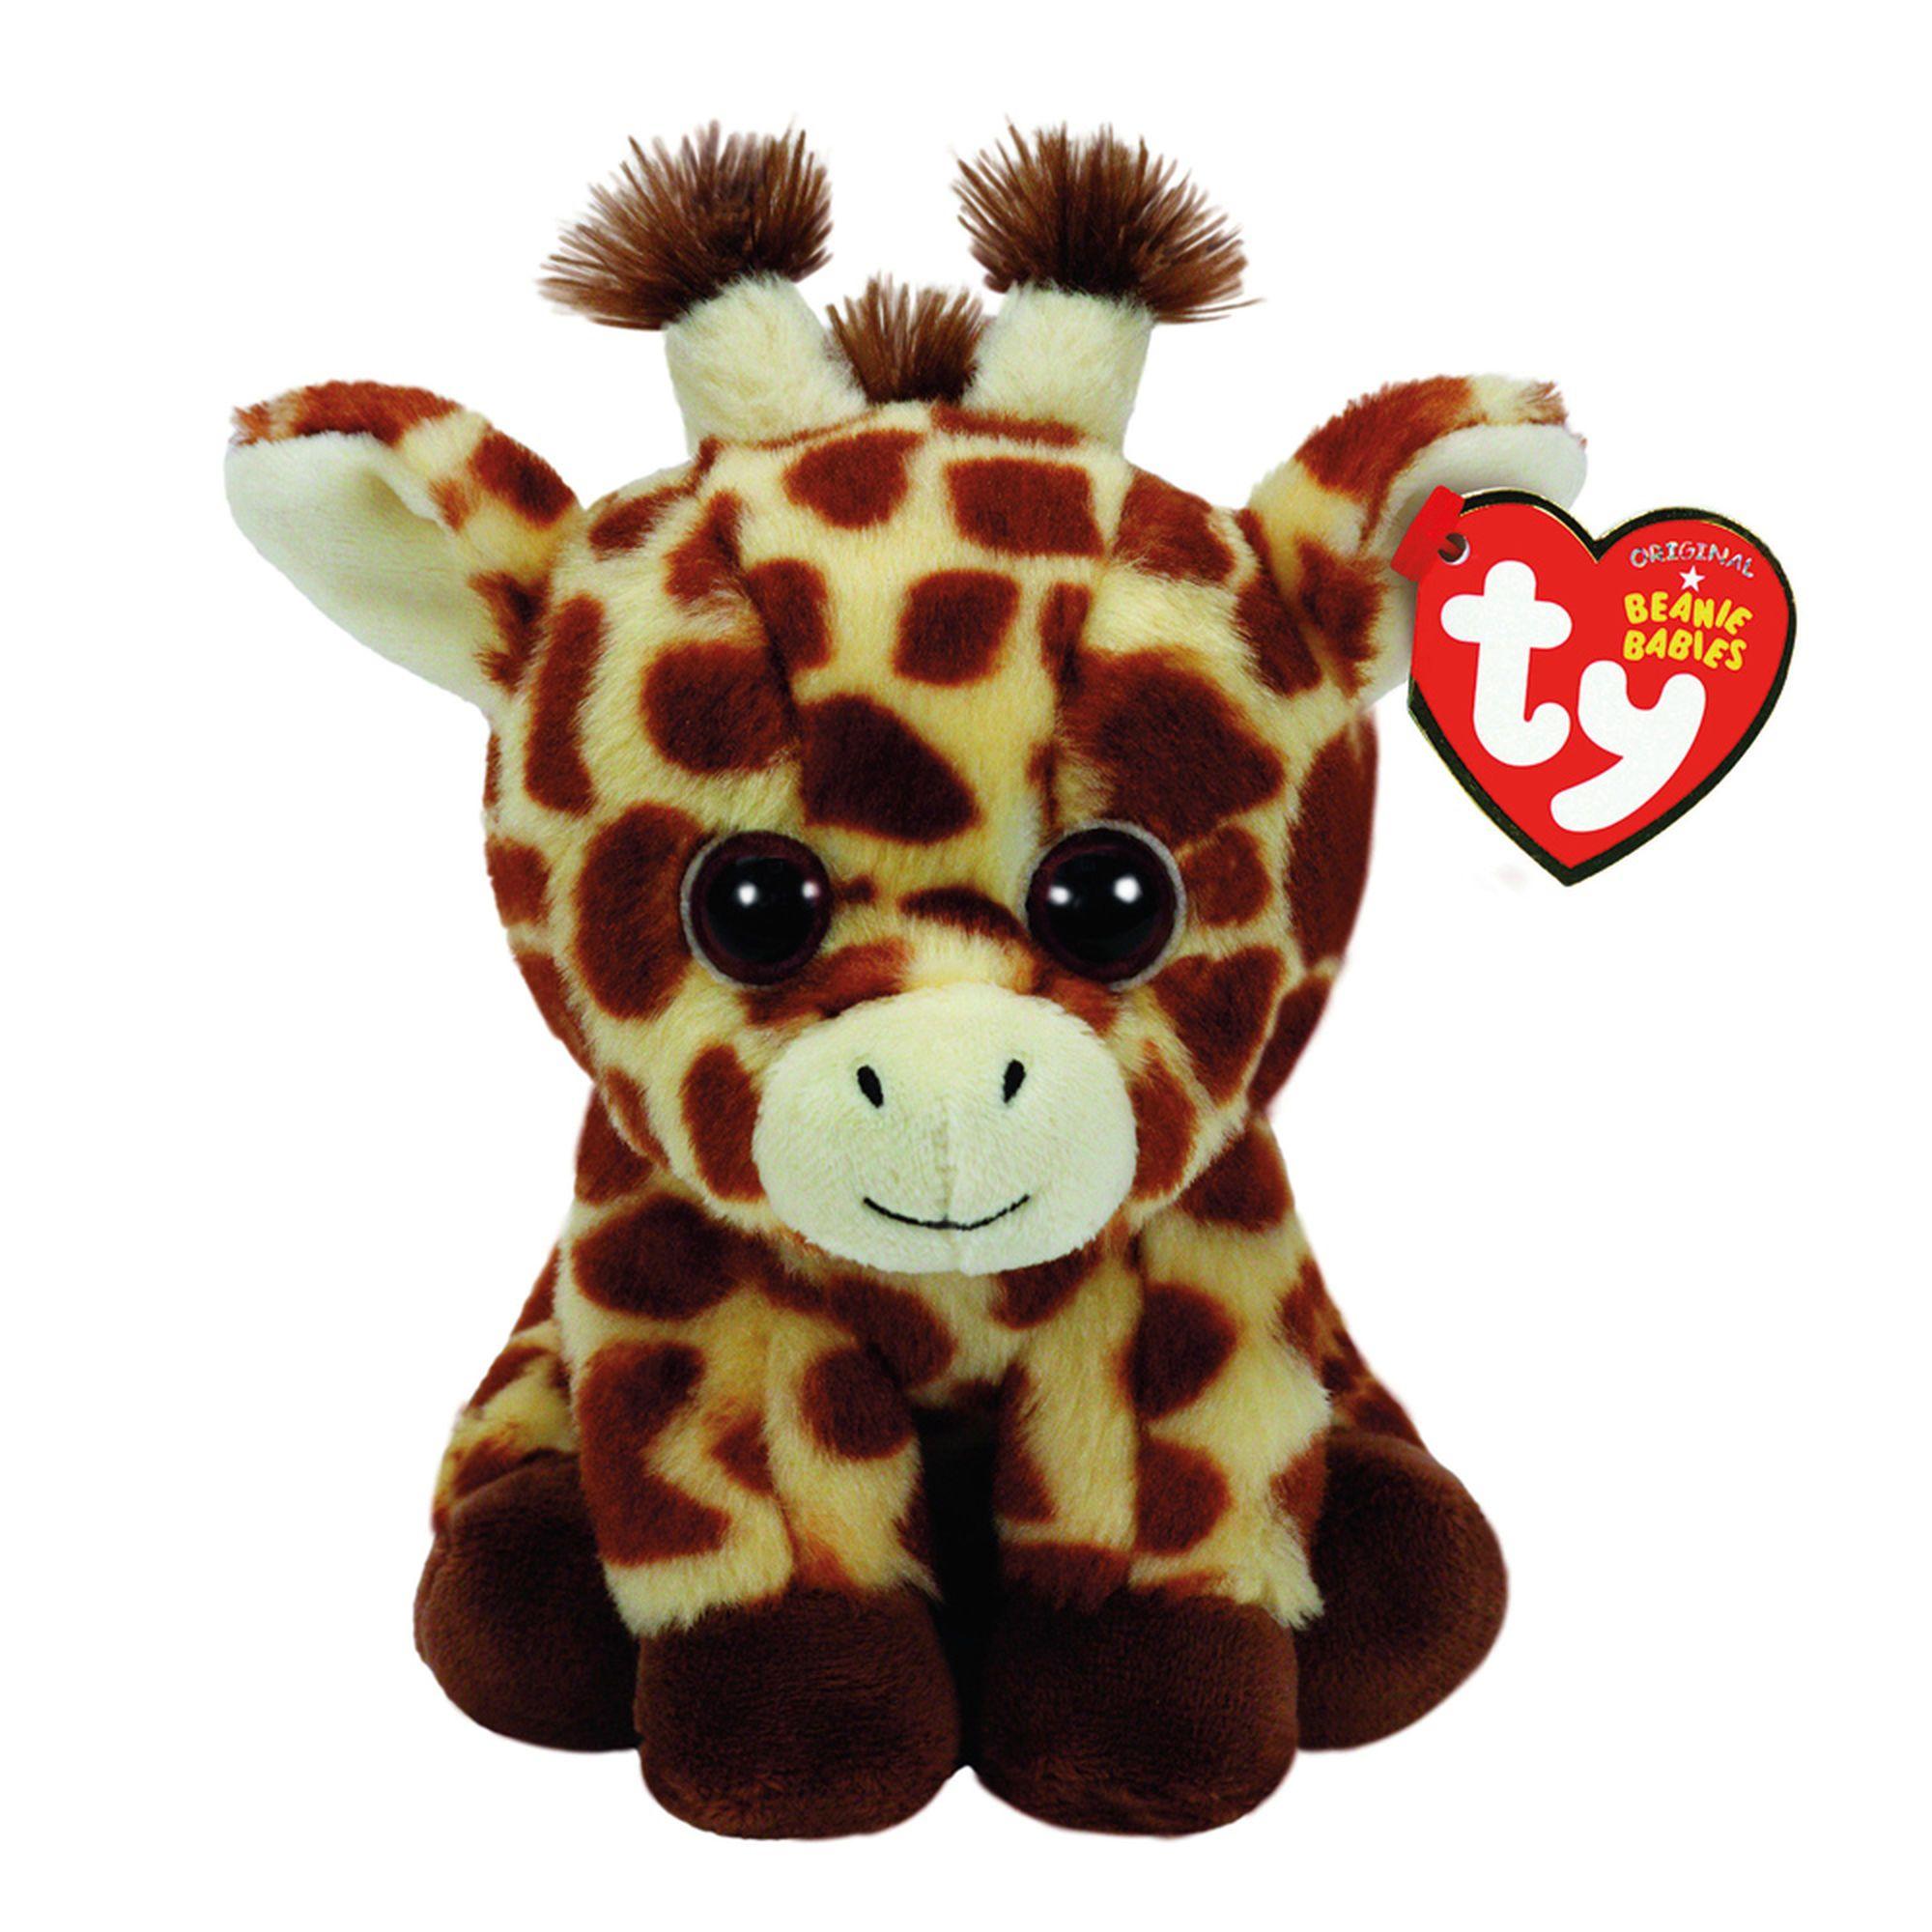 Ty Beanie Baby Small Peaches the Giraffe Plush Toy   Claire's US   Giraffe  plush, Original beanie babies, Giraffe soft toy